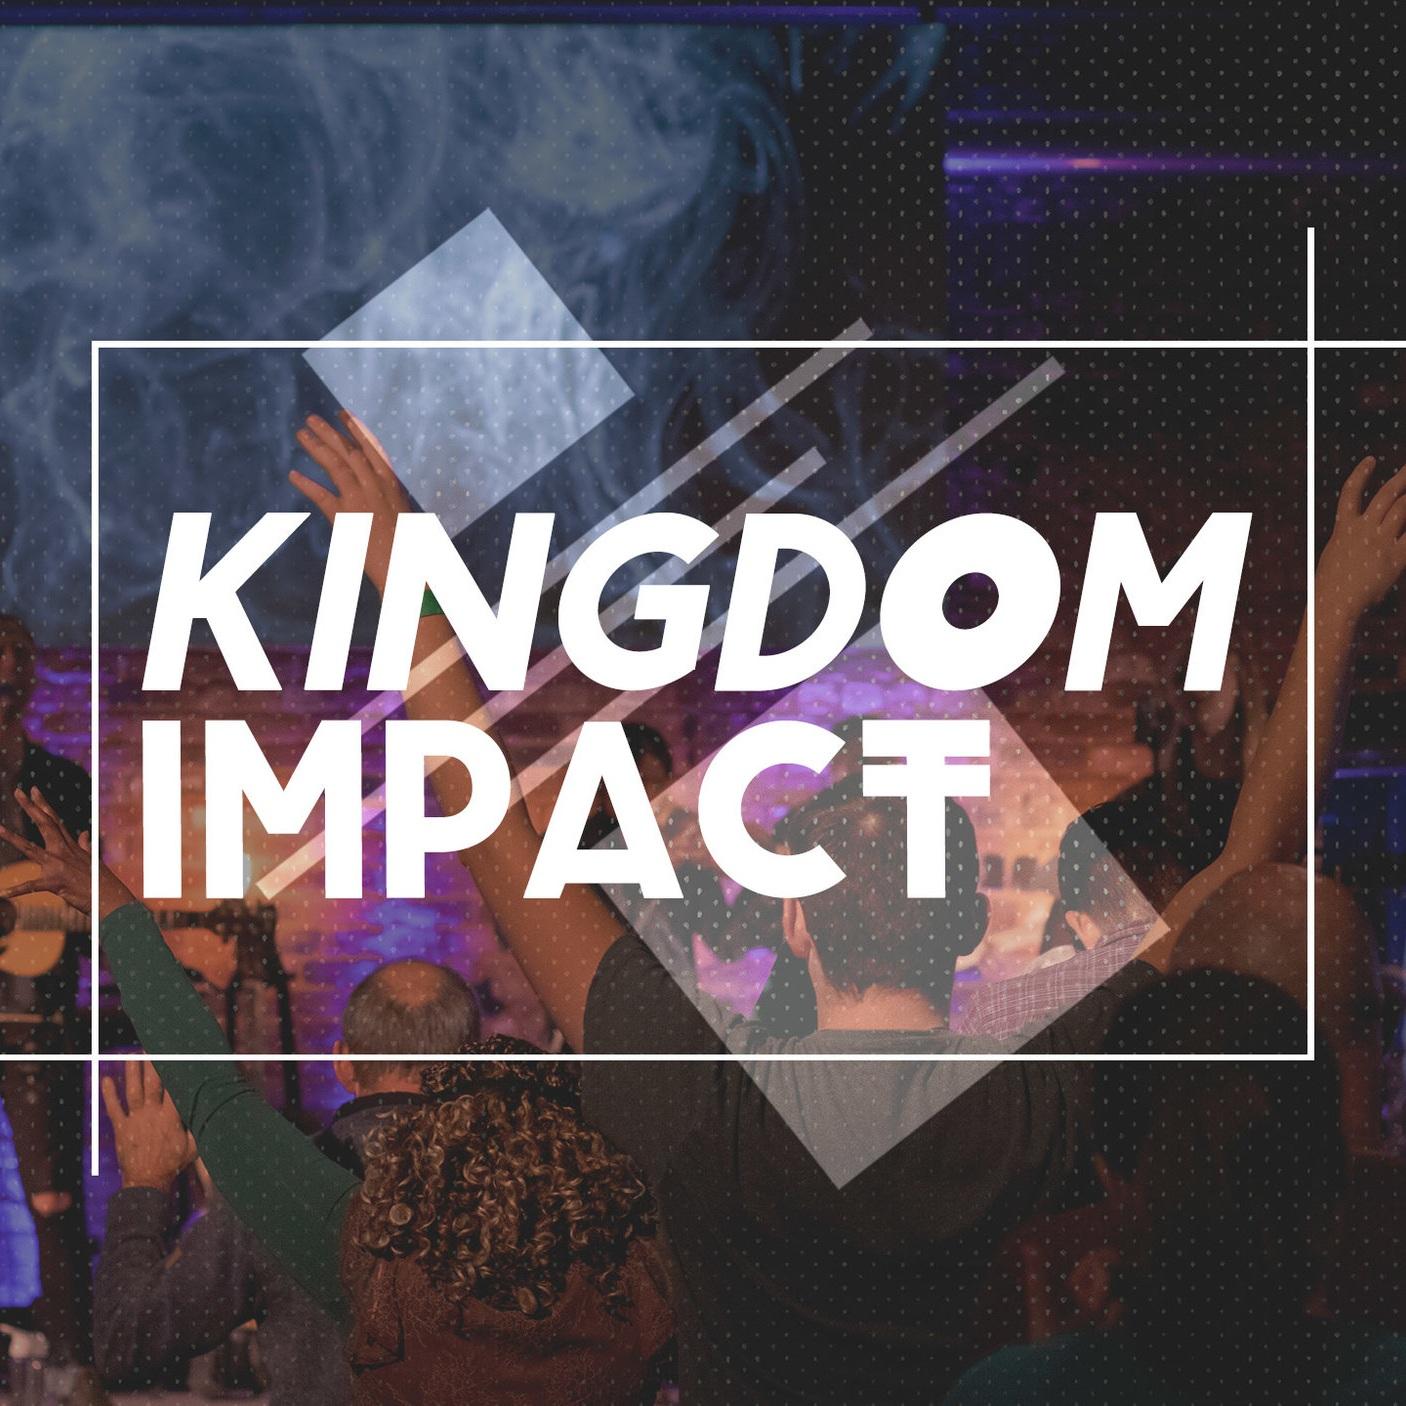 Kingdom Impact 2019 - Web Banner.jpg